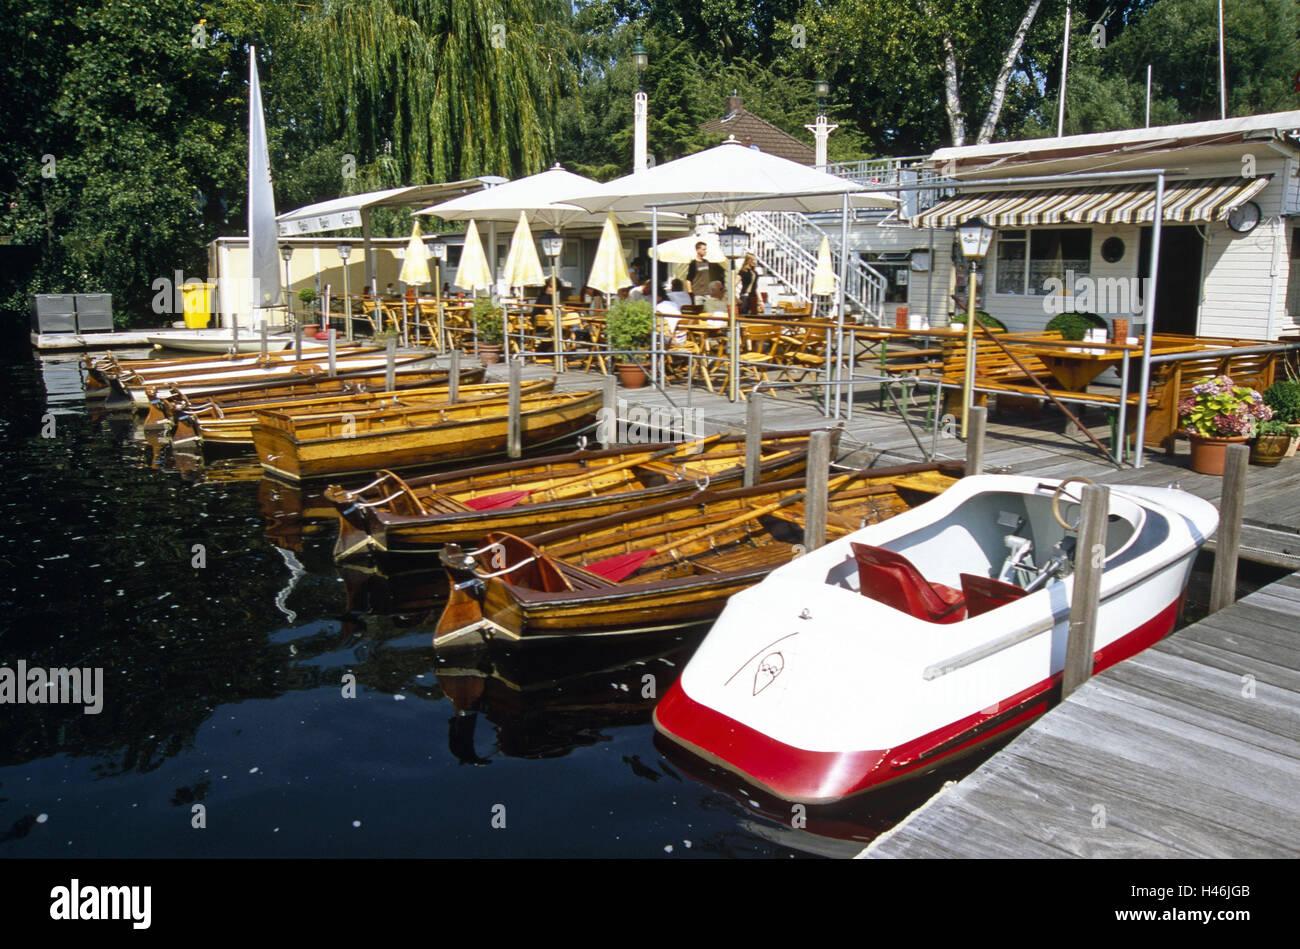 Alemania Hamburgo Rotherbaum Oar Botas Bodo S Landing